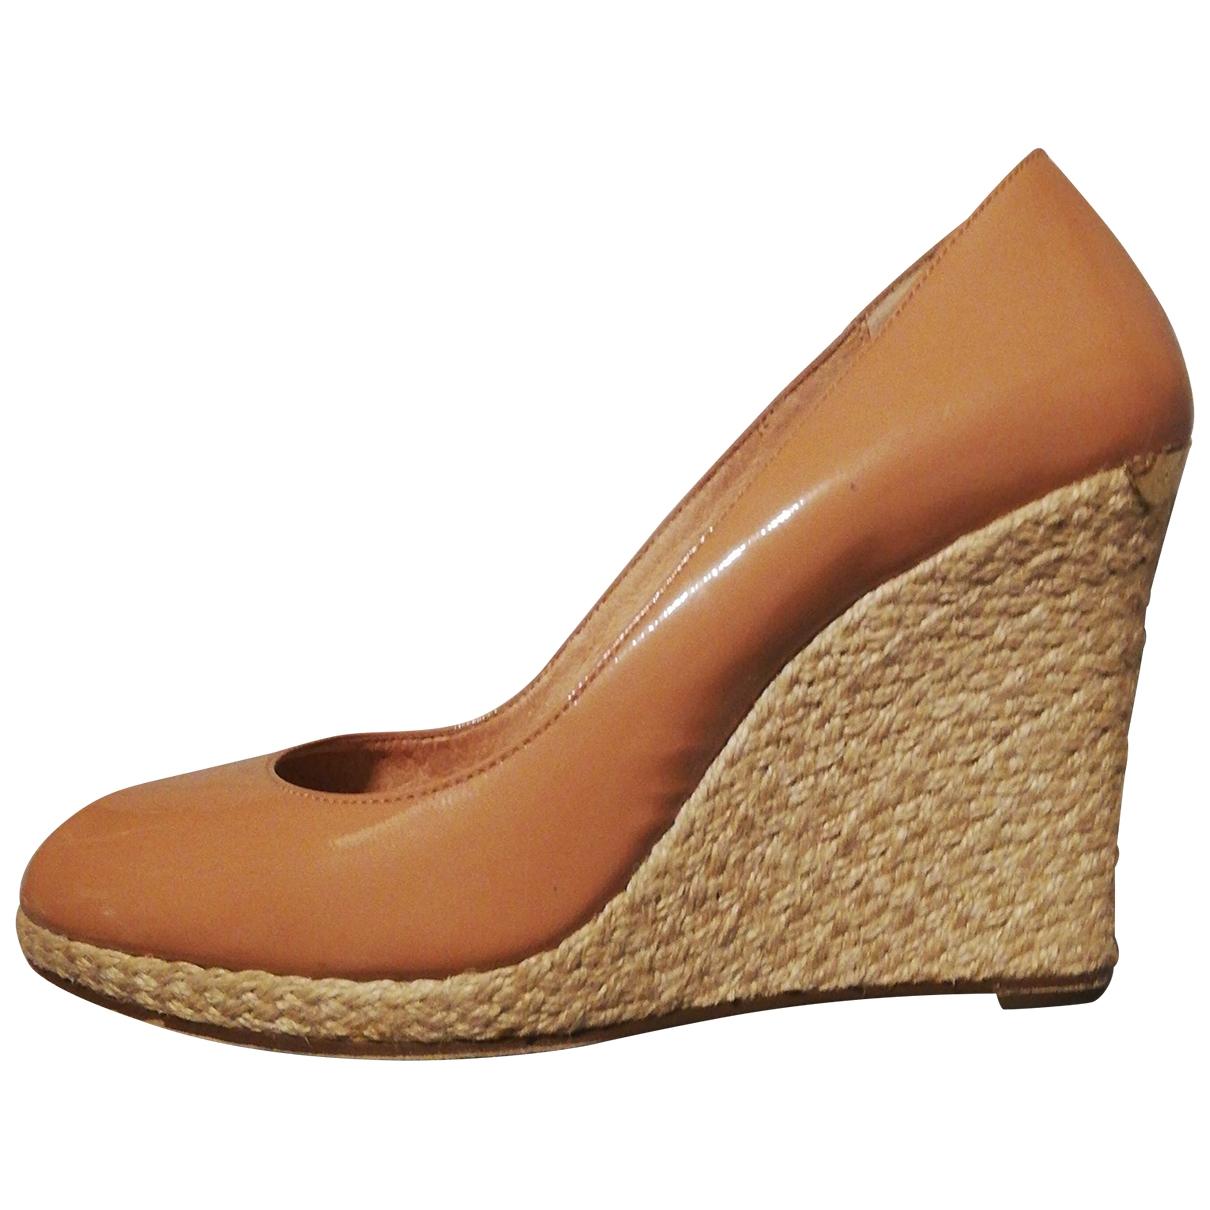 Michael Kors \N Pink Patent leather Espadrilles for Women 38 EU